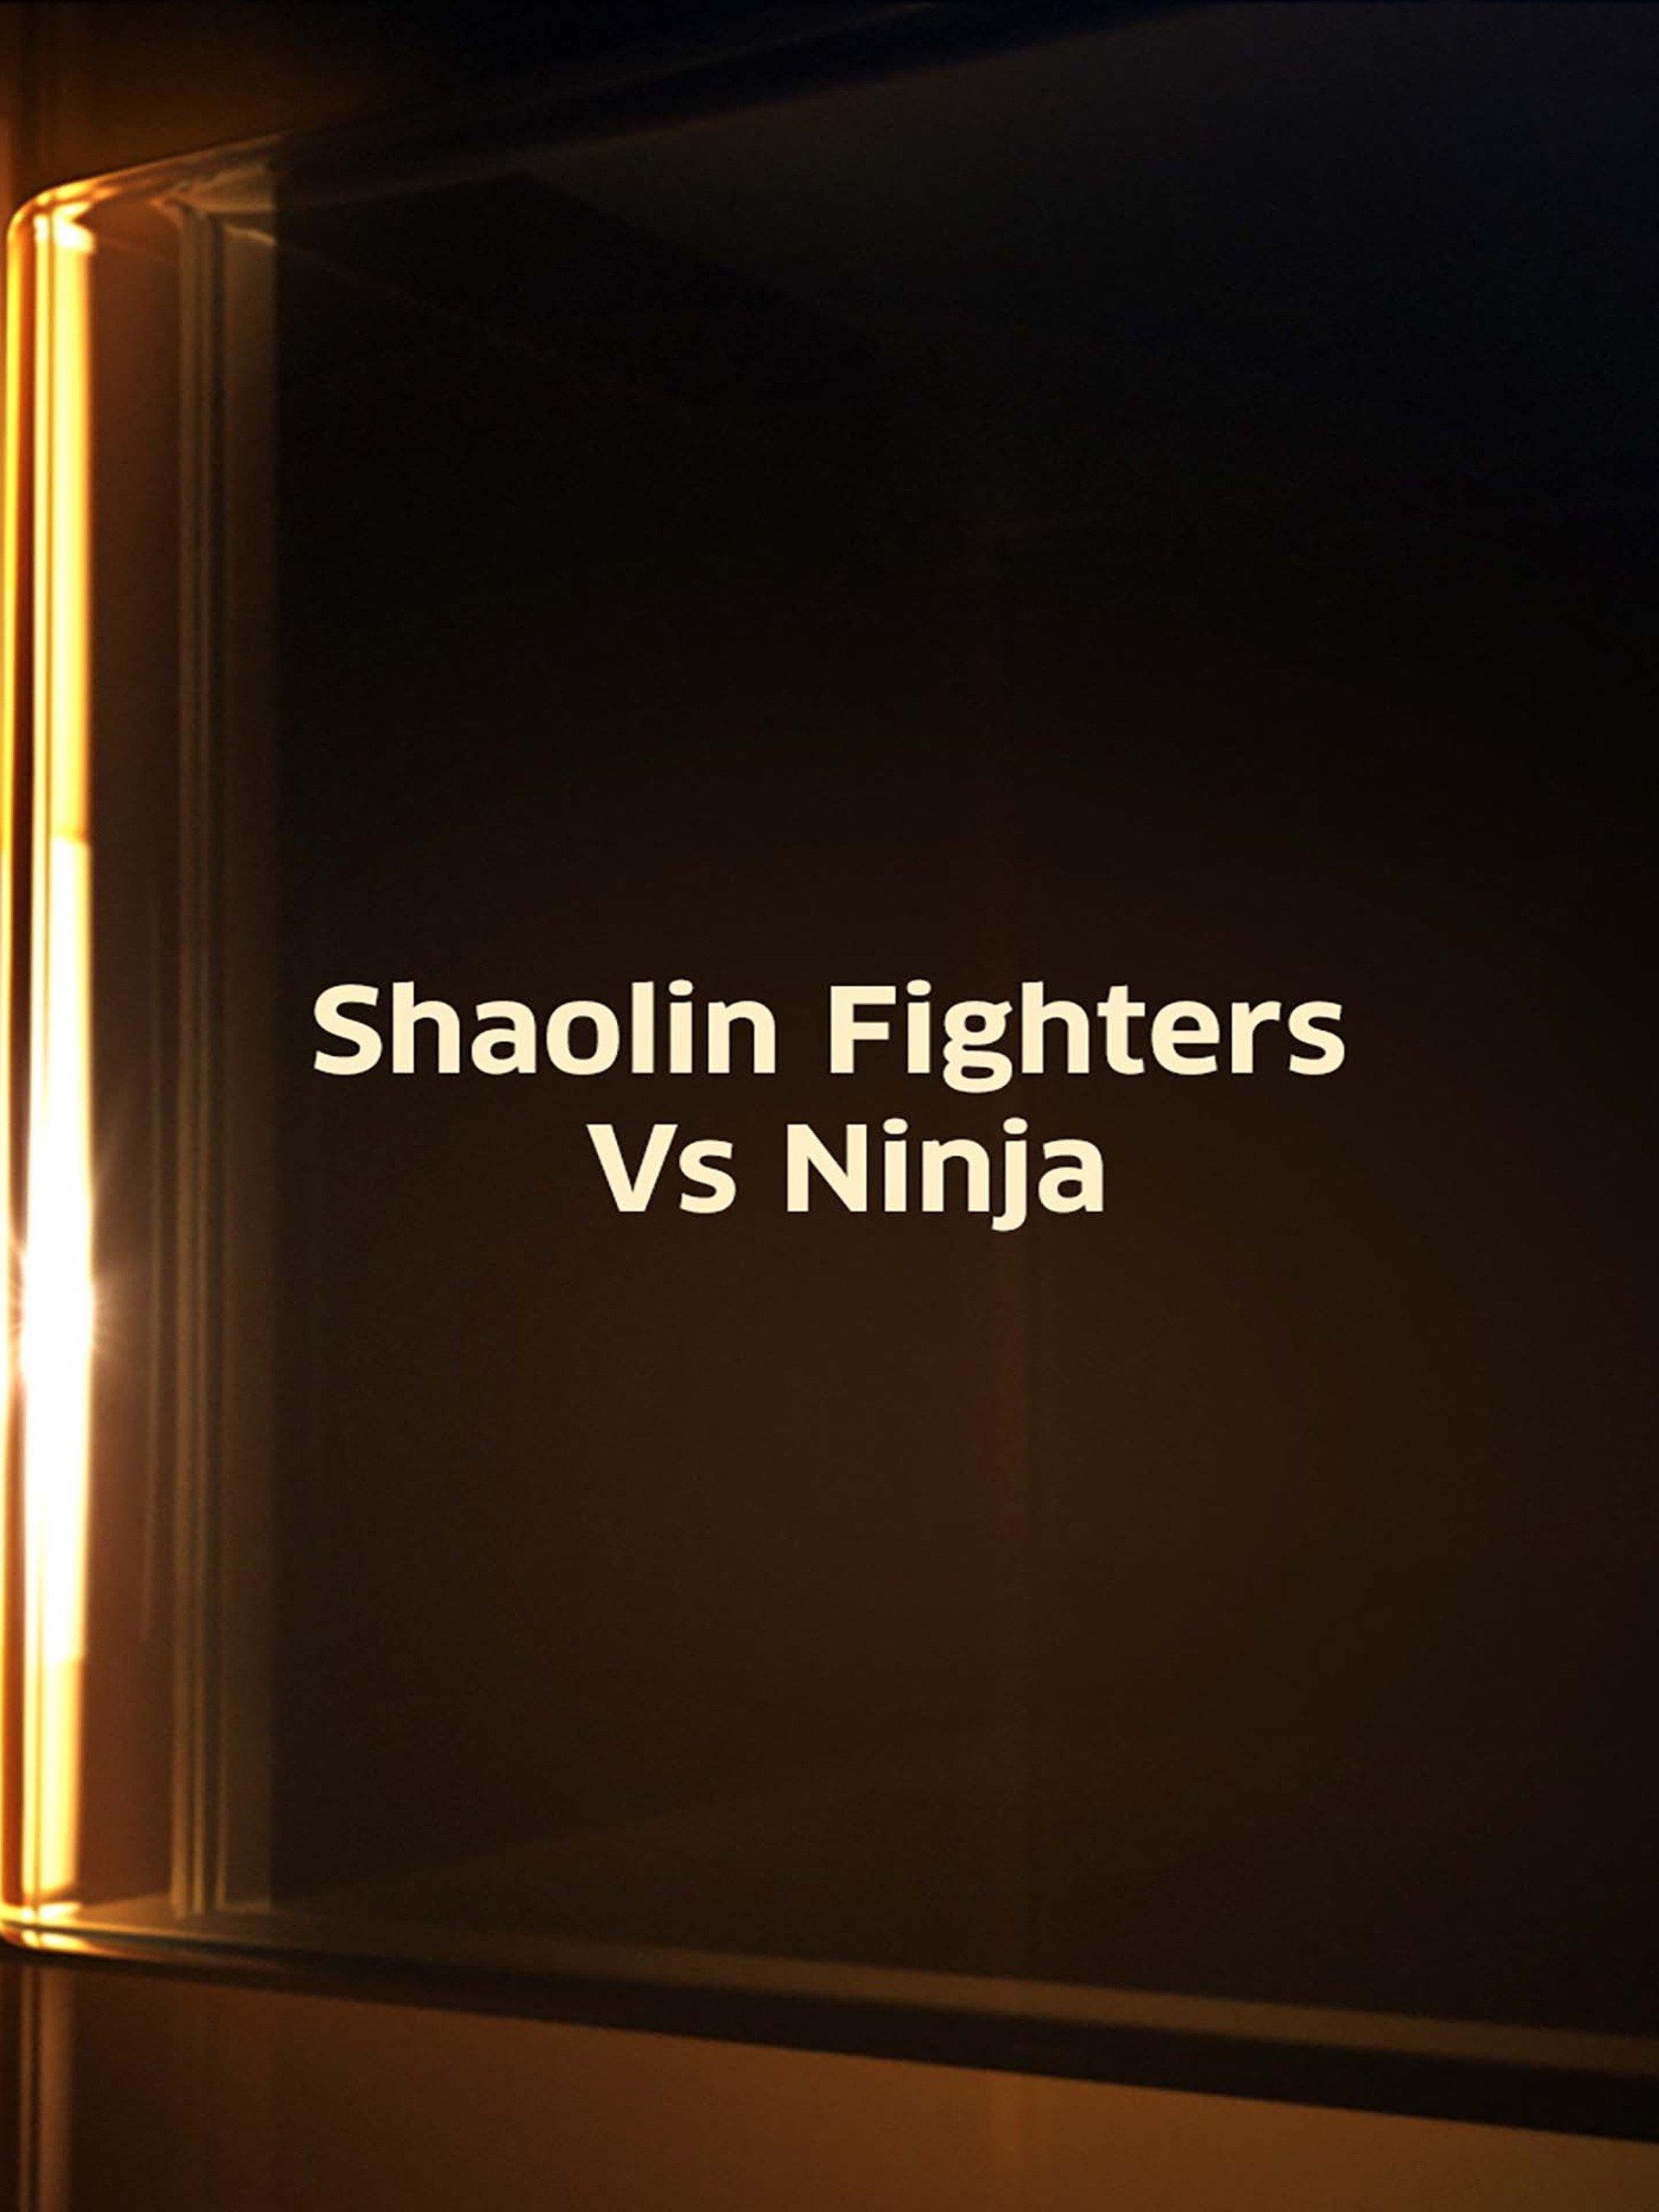 Amazon.com: Watch Shaolin Fighters vs. Ninja | Prime Video